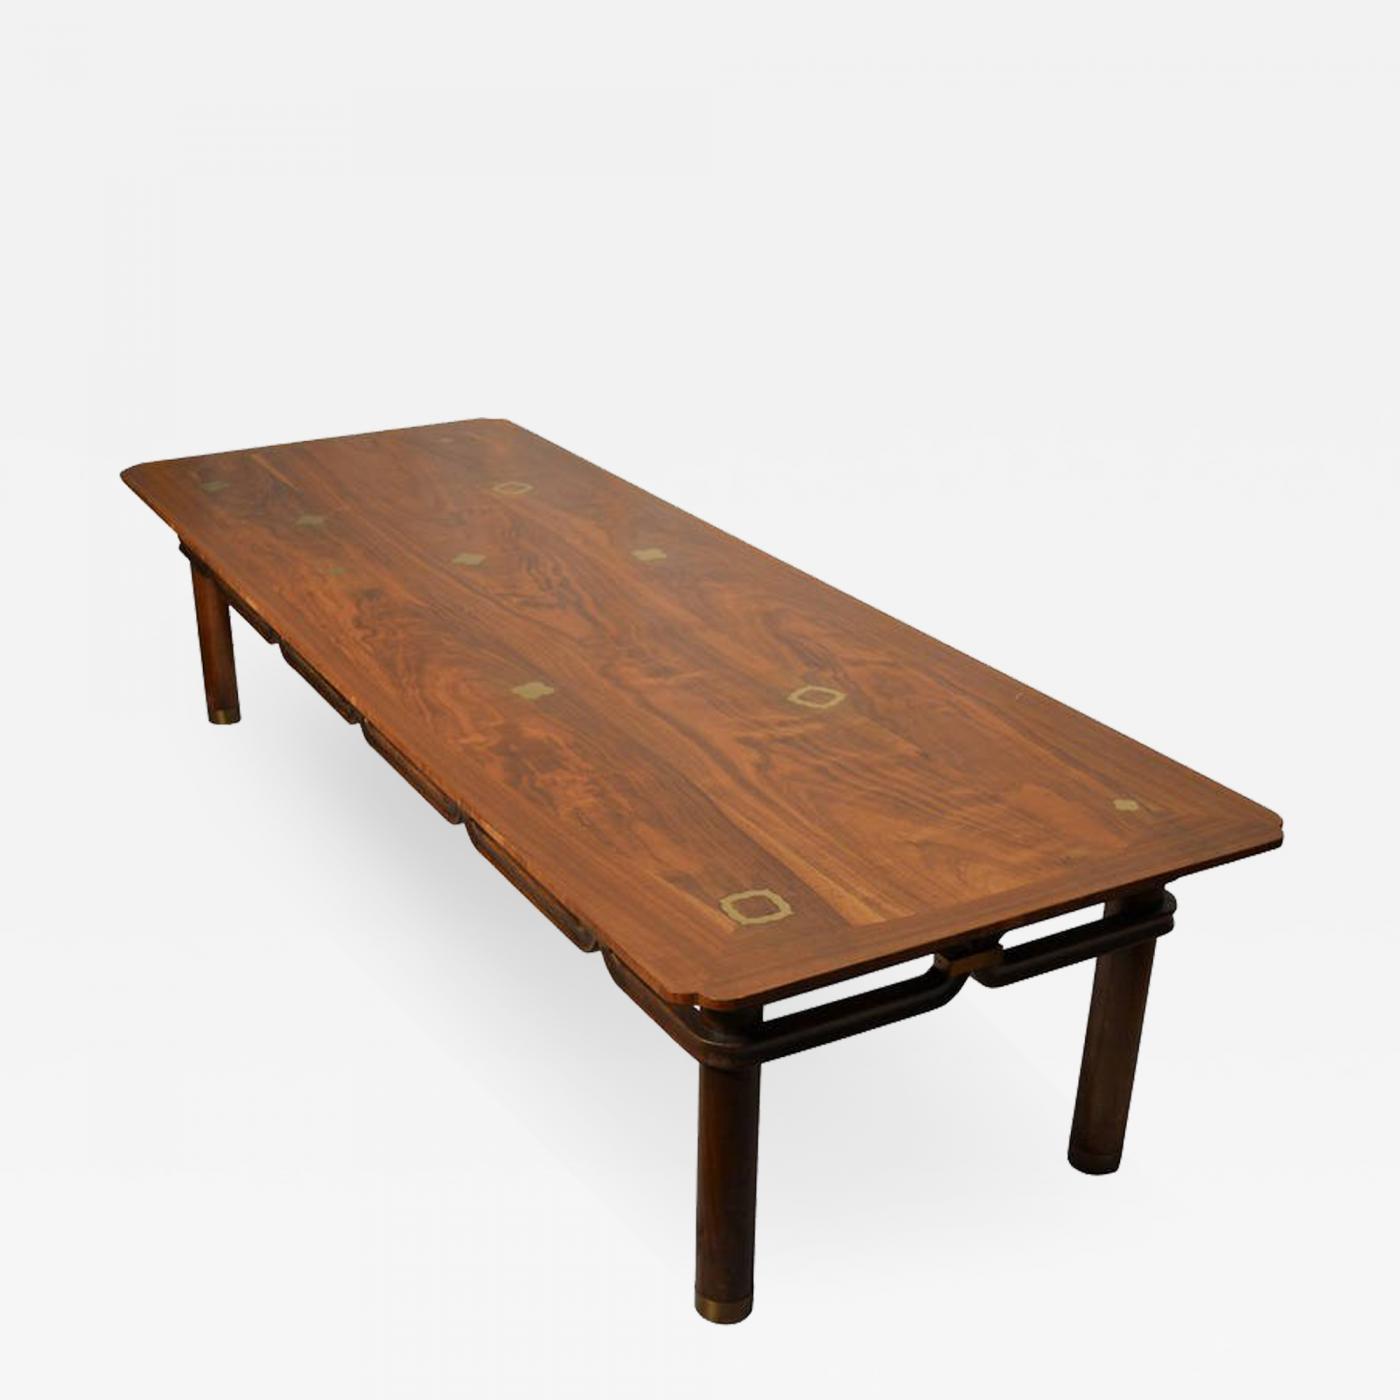 Bert England Brass Inlayed Asian Style Coffee Table Johnson Furniture Co Circa 1960